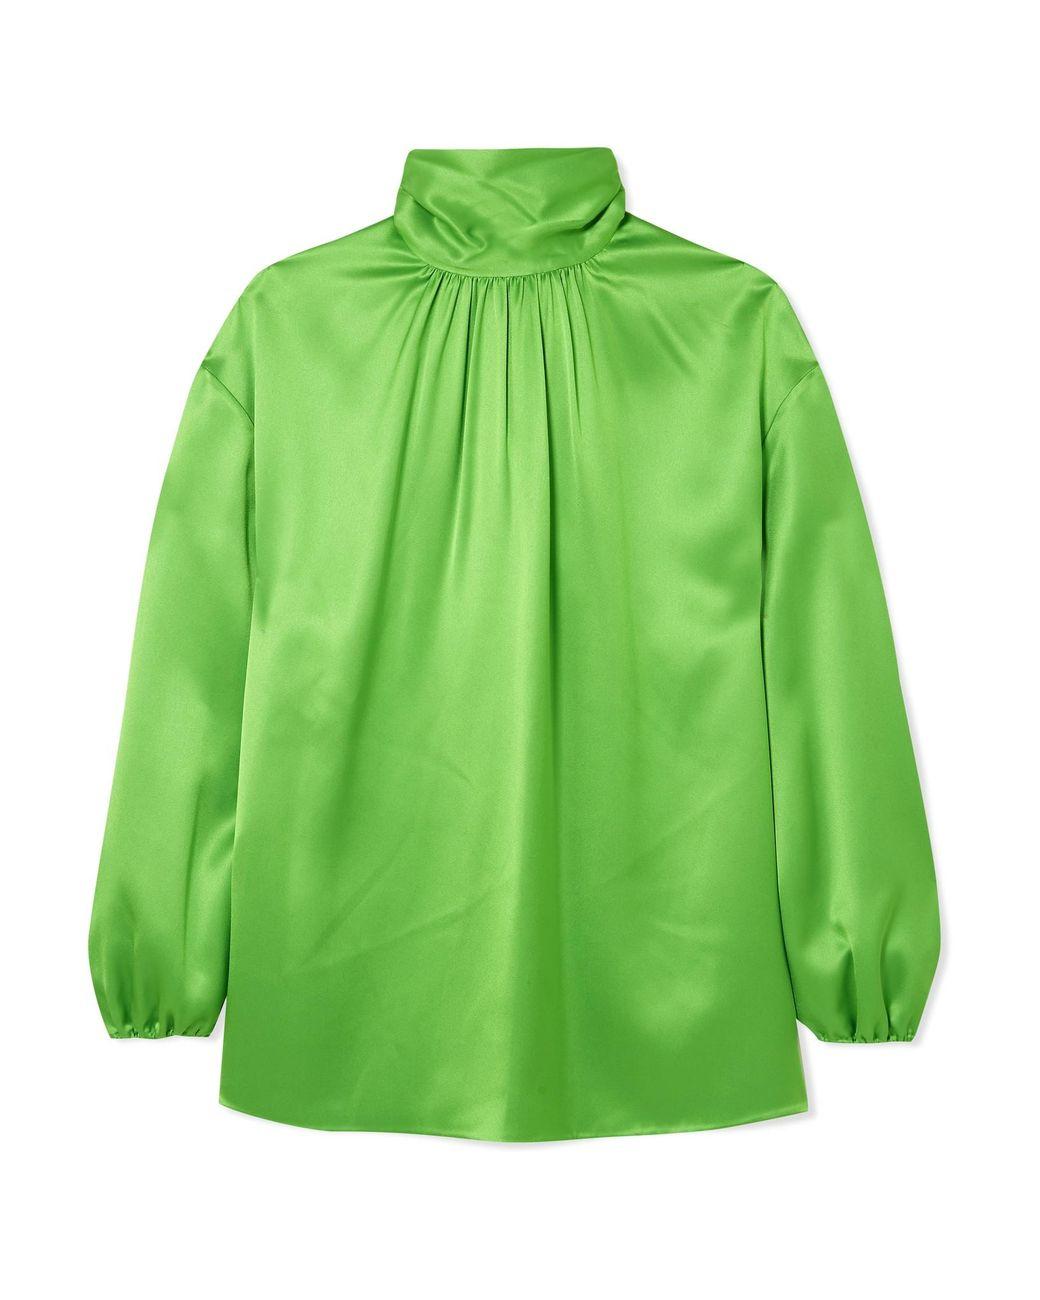 eea43882316d1 Prada Gathered Neon Silk-satin Blouse in Green - Lyst